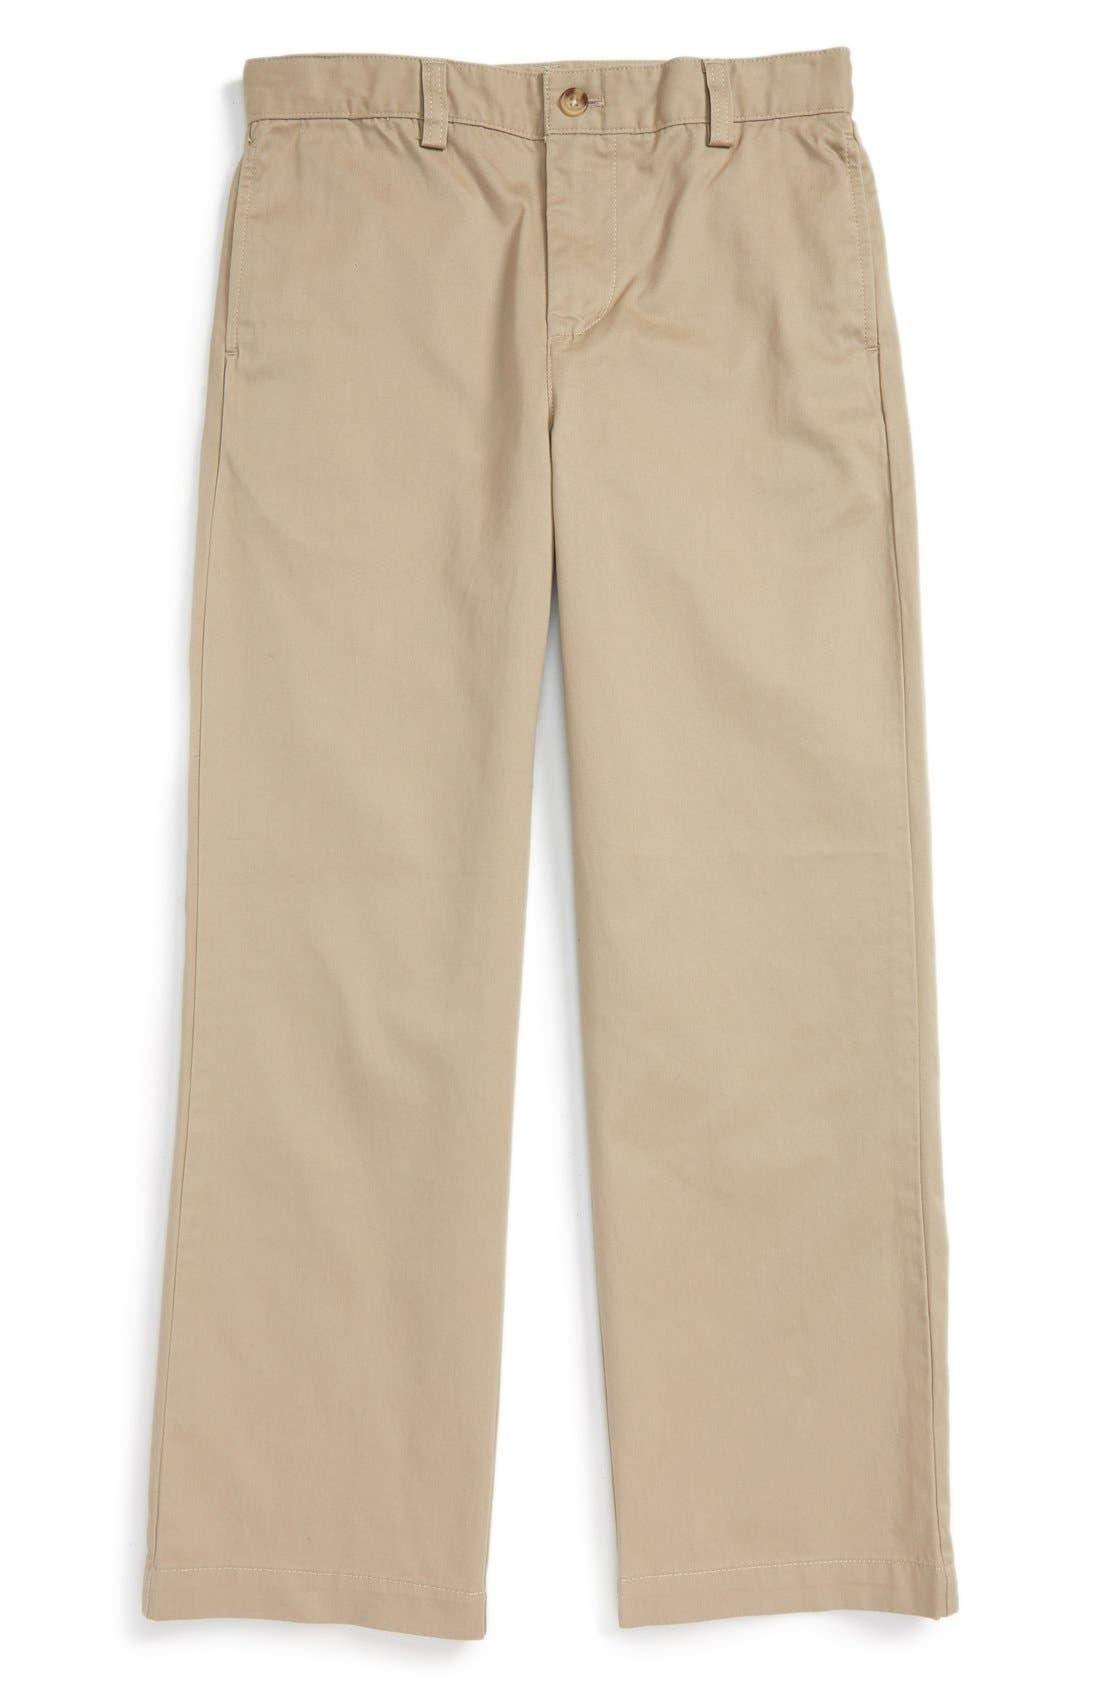 Club Cotton Twill Pants,                             Main thumbnail 1, color,